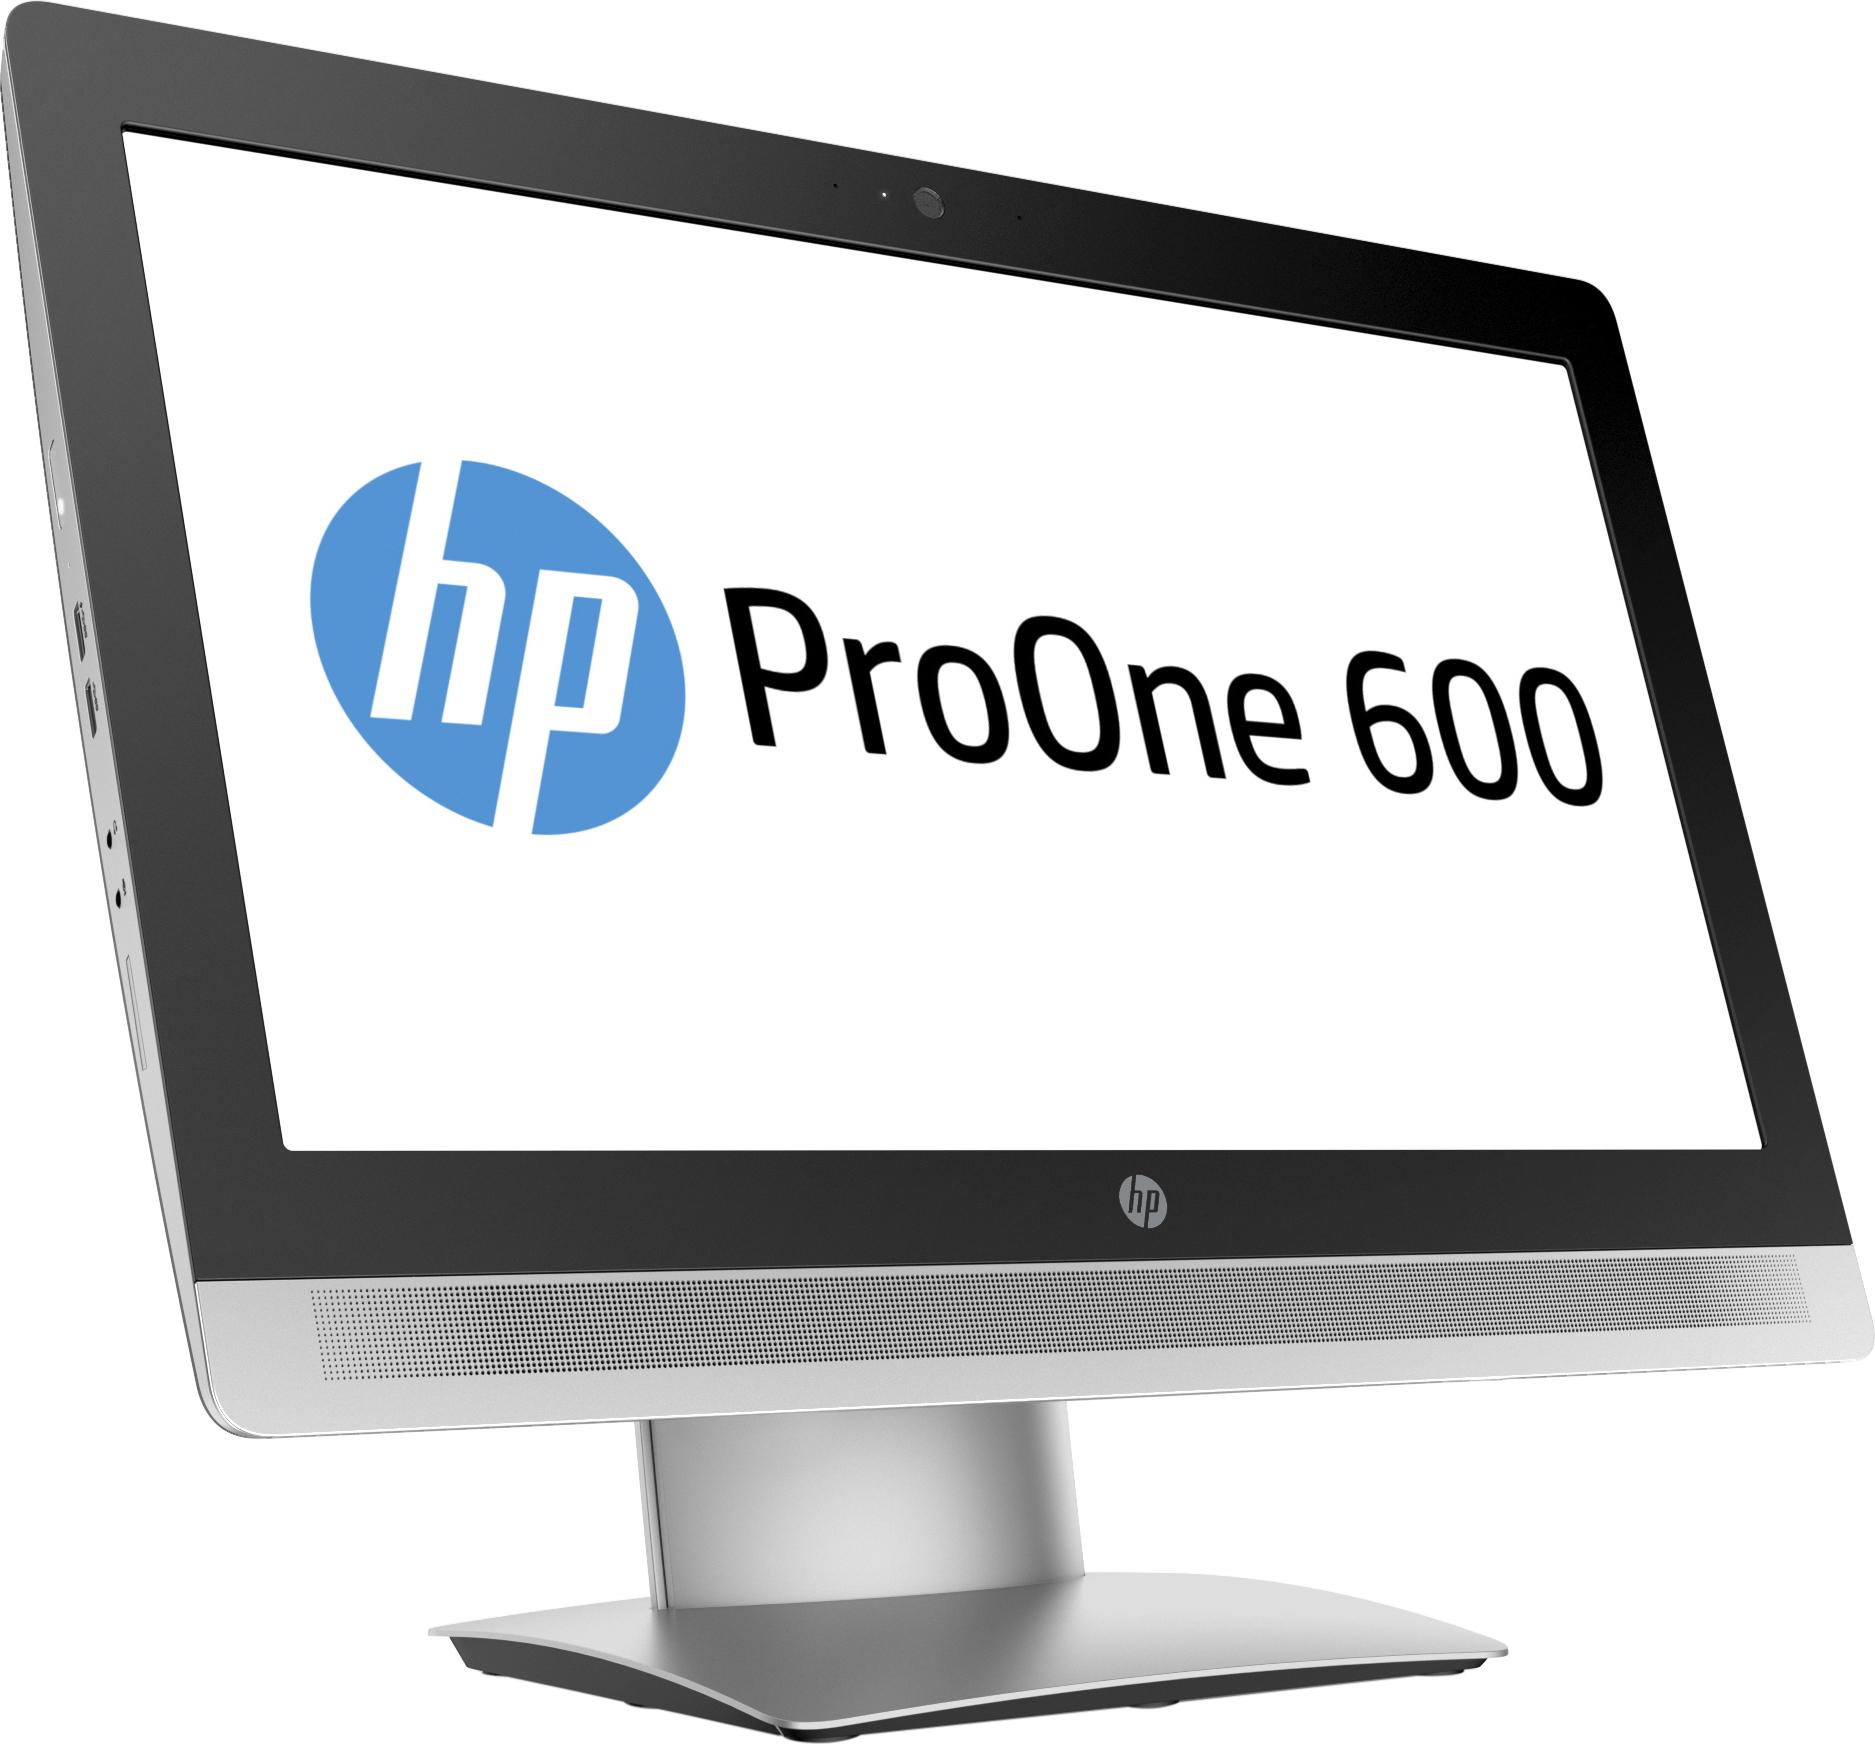 "HP ProOne 600 G2 3.2GHz i5-6500 21.5"" 1920 x 1080pixels Black,Silver"